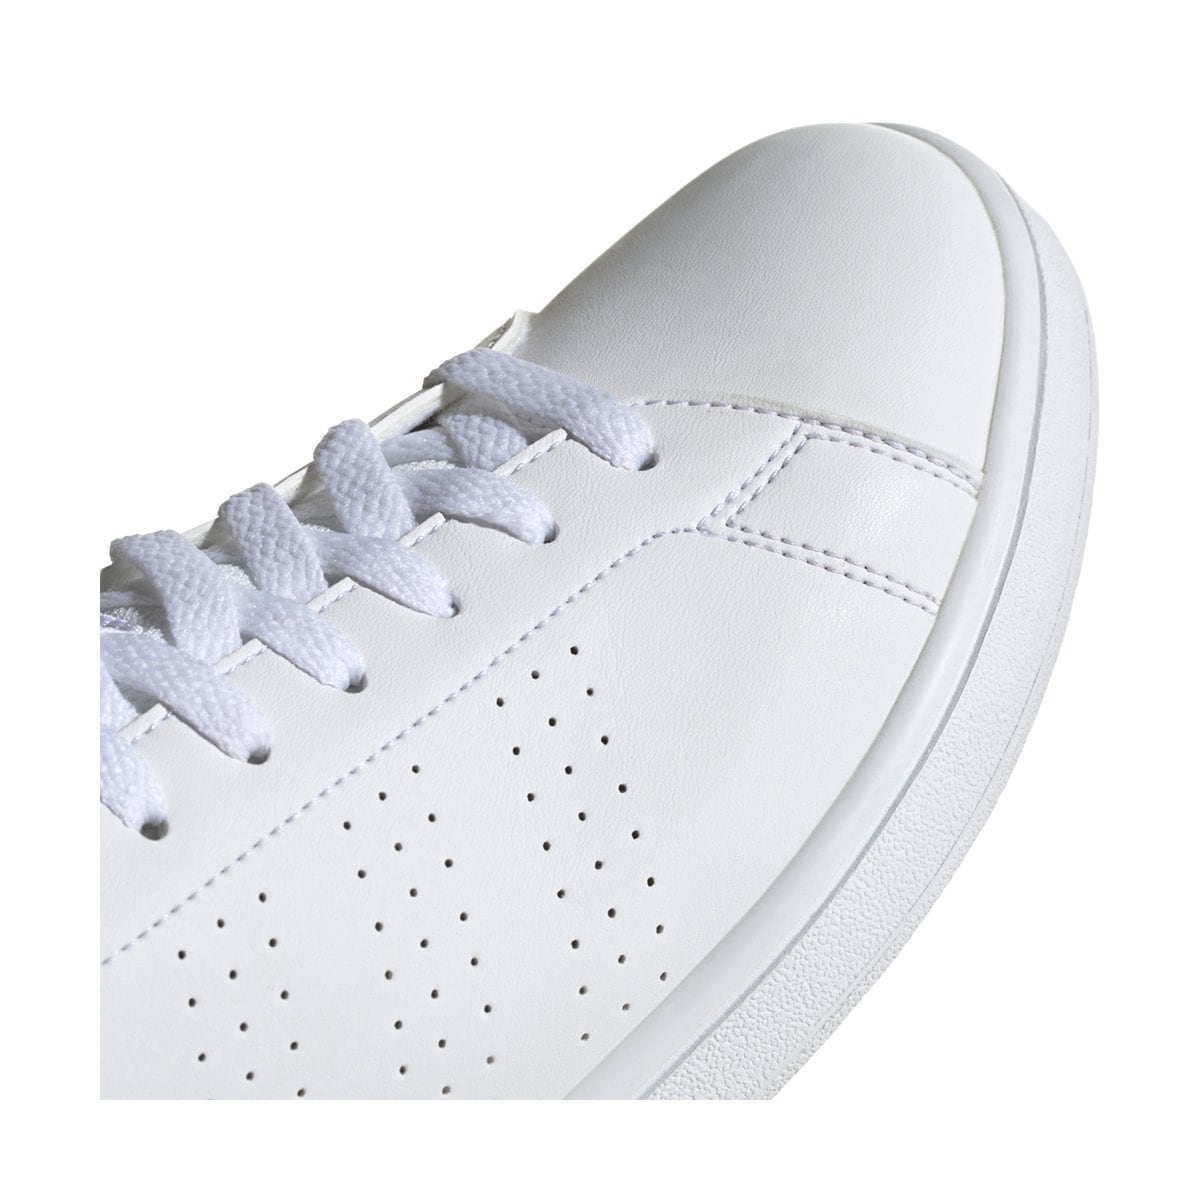 Tenis Casual Advantage  Blanco Adidas - Caballero